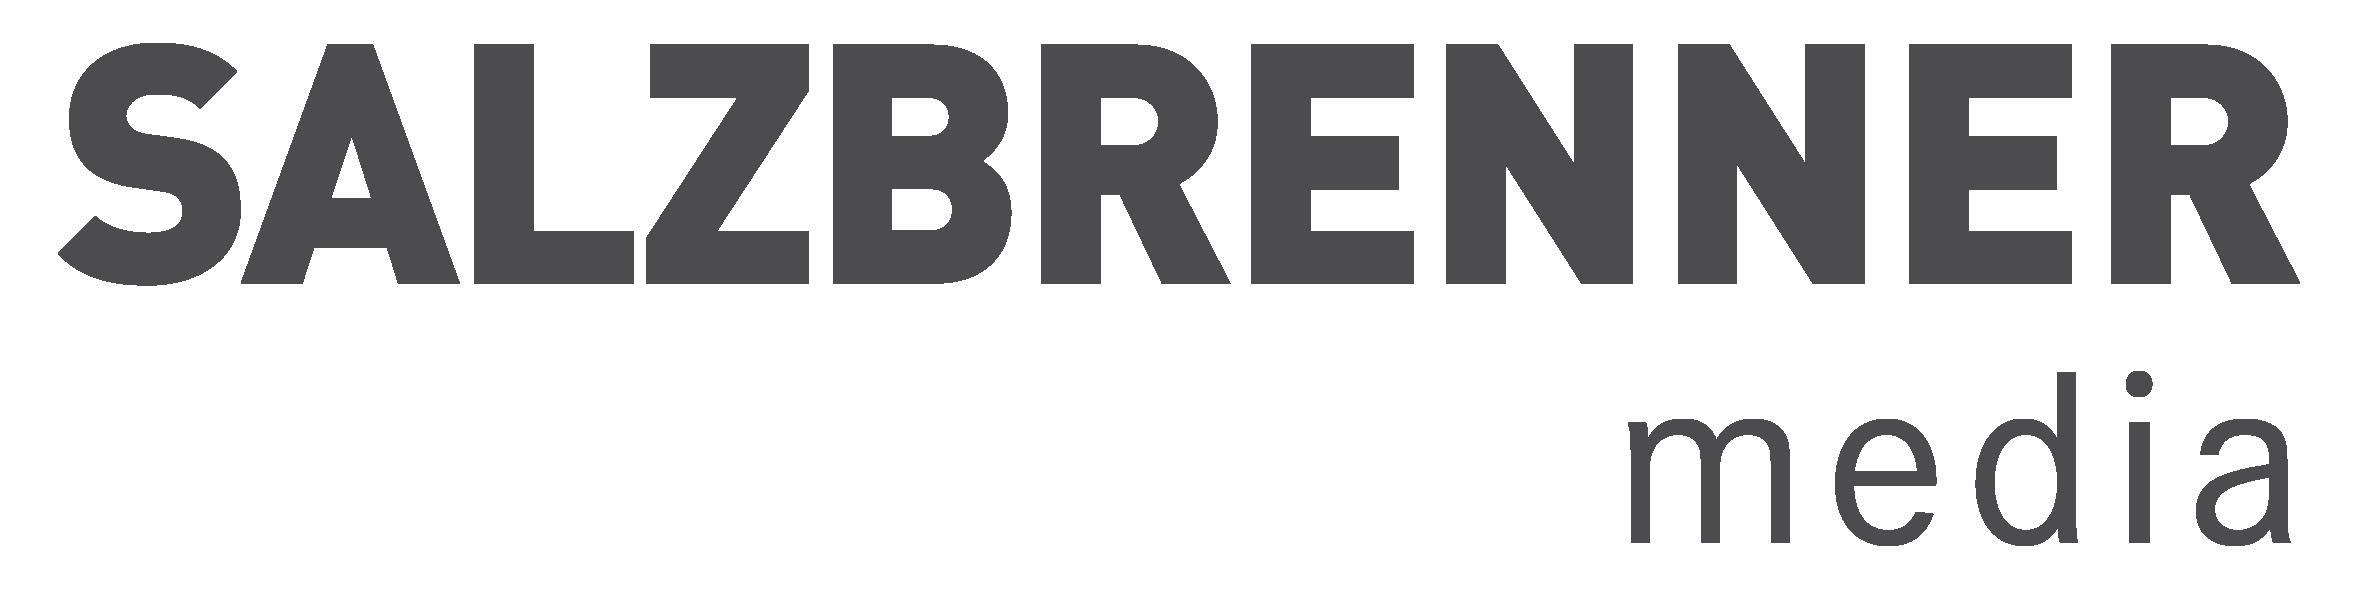 logo-salzbrenner-media